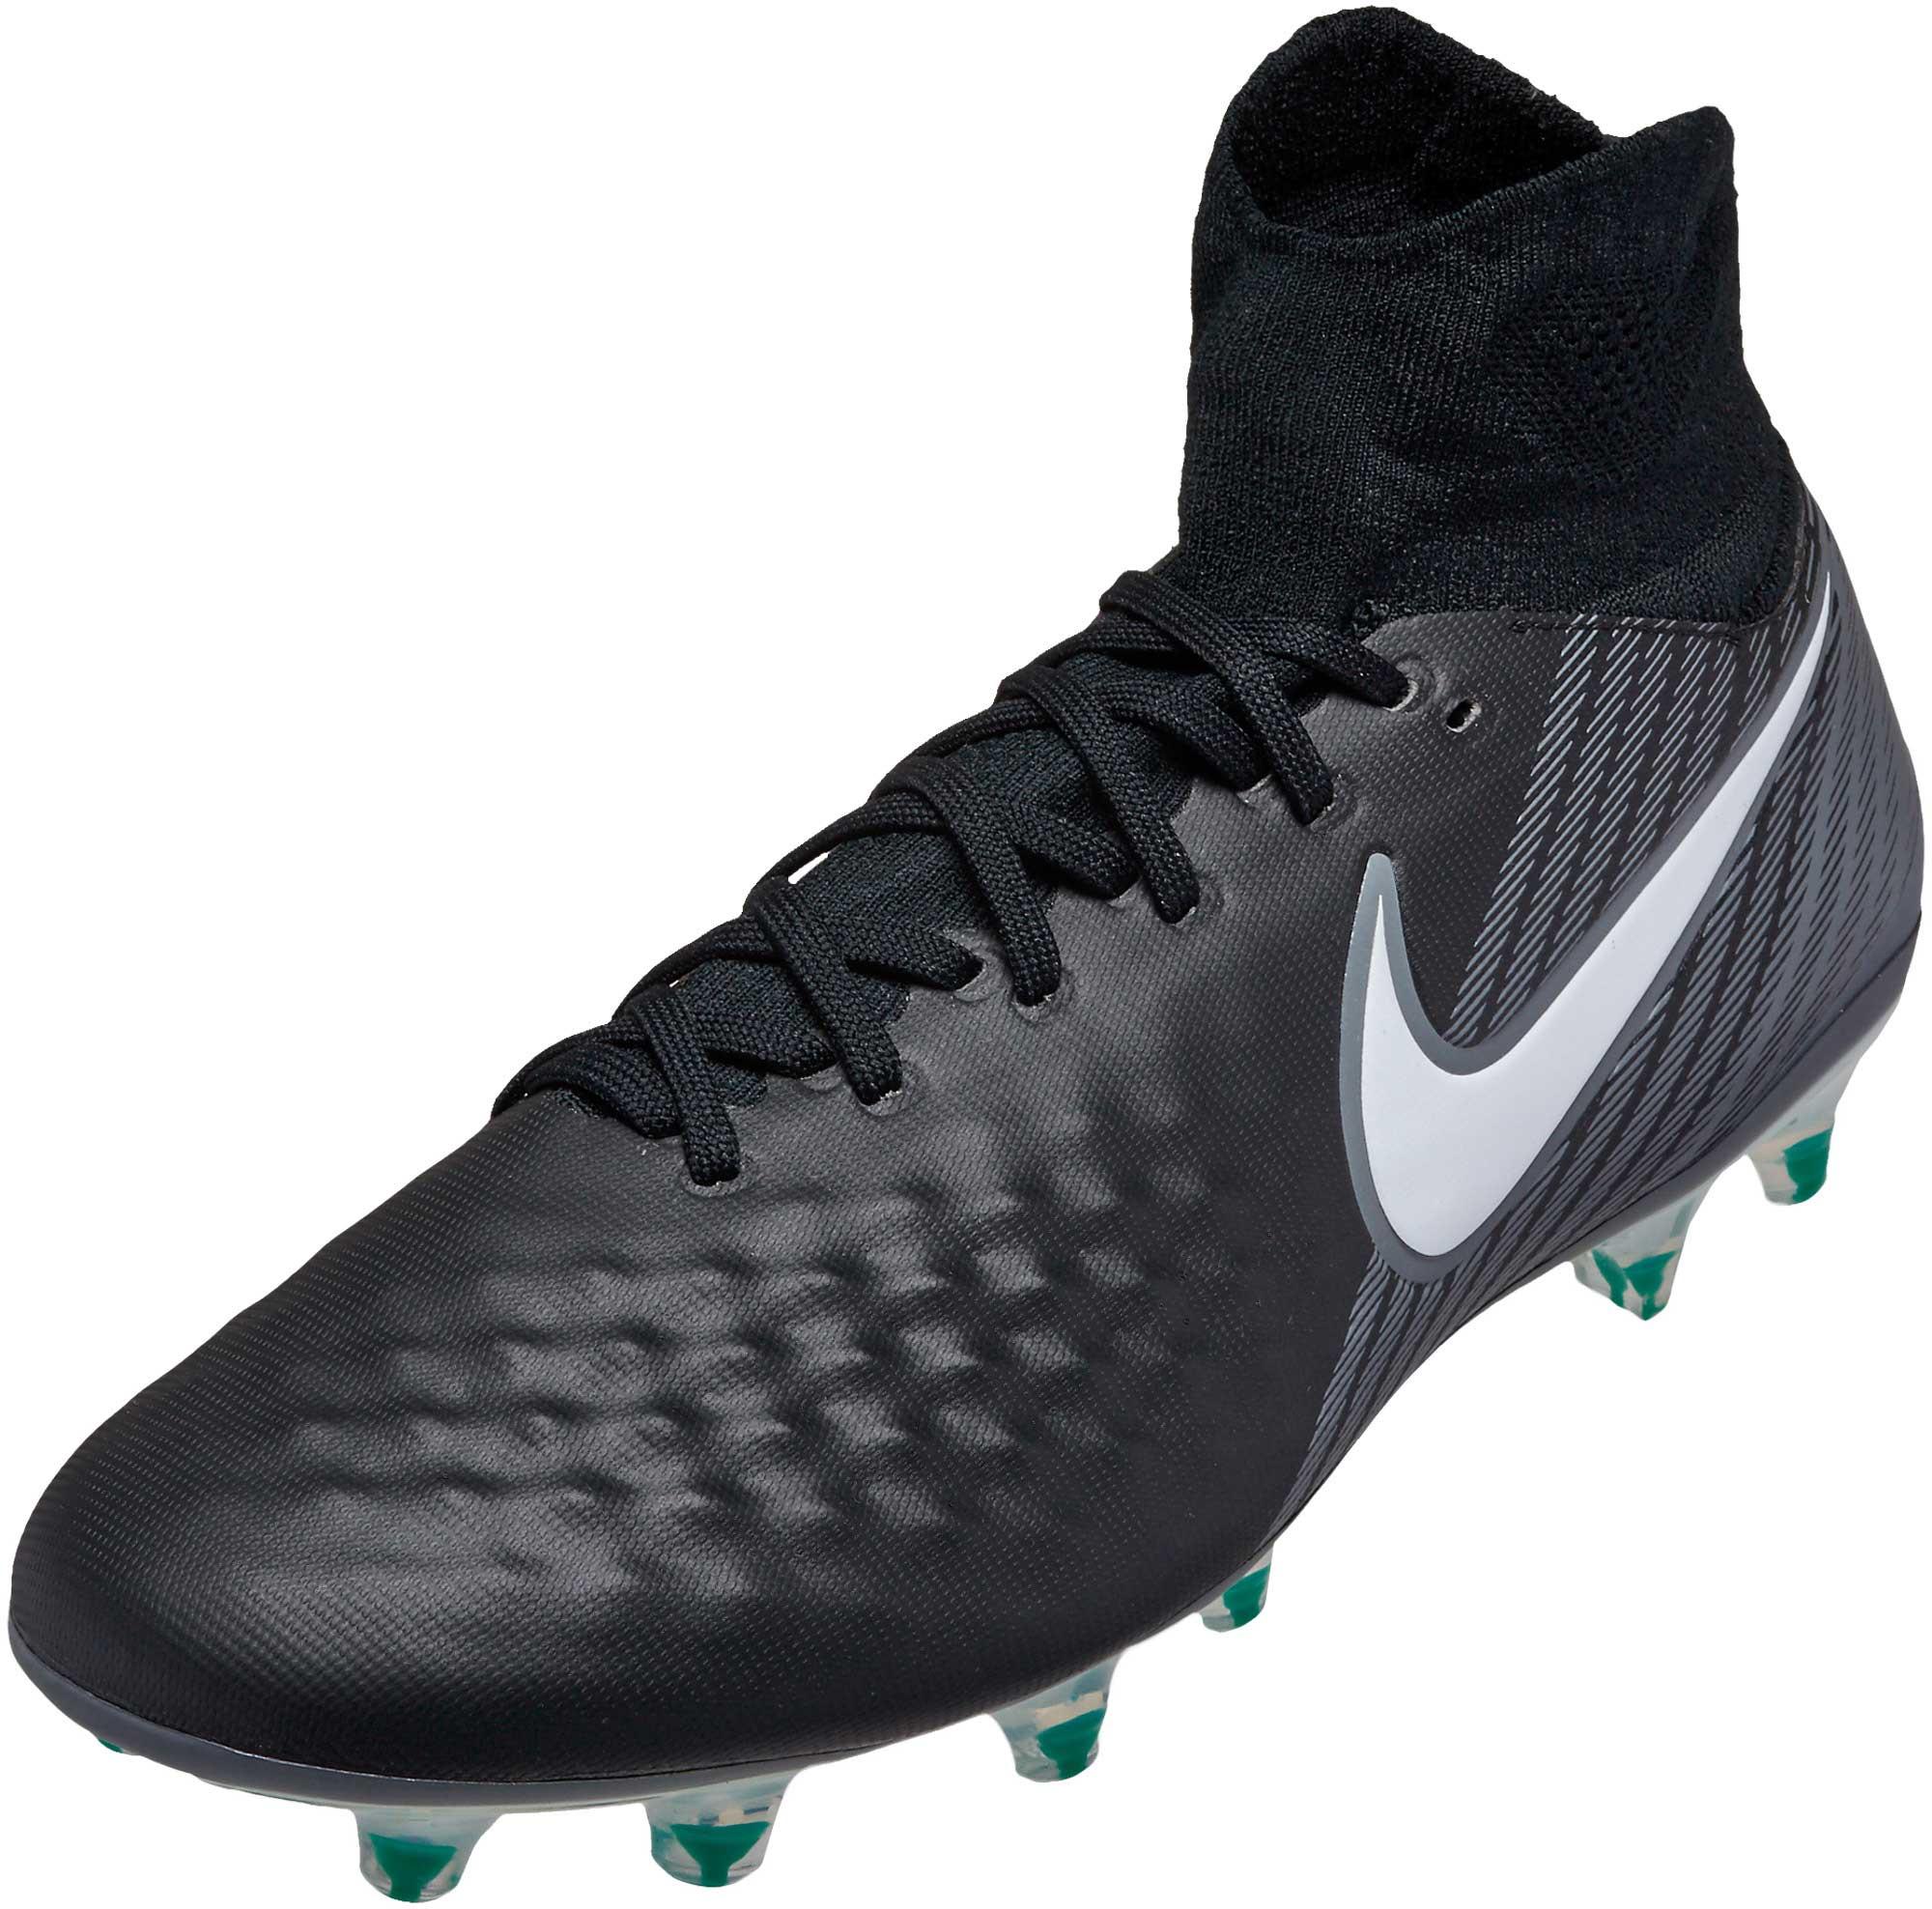 Nike Magista Orden II FG – Black/White